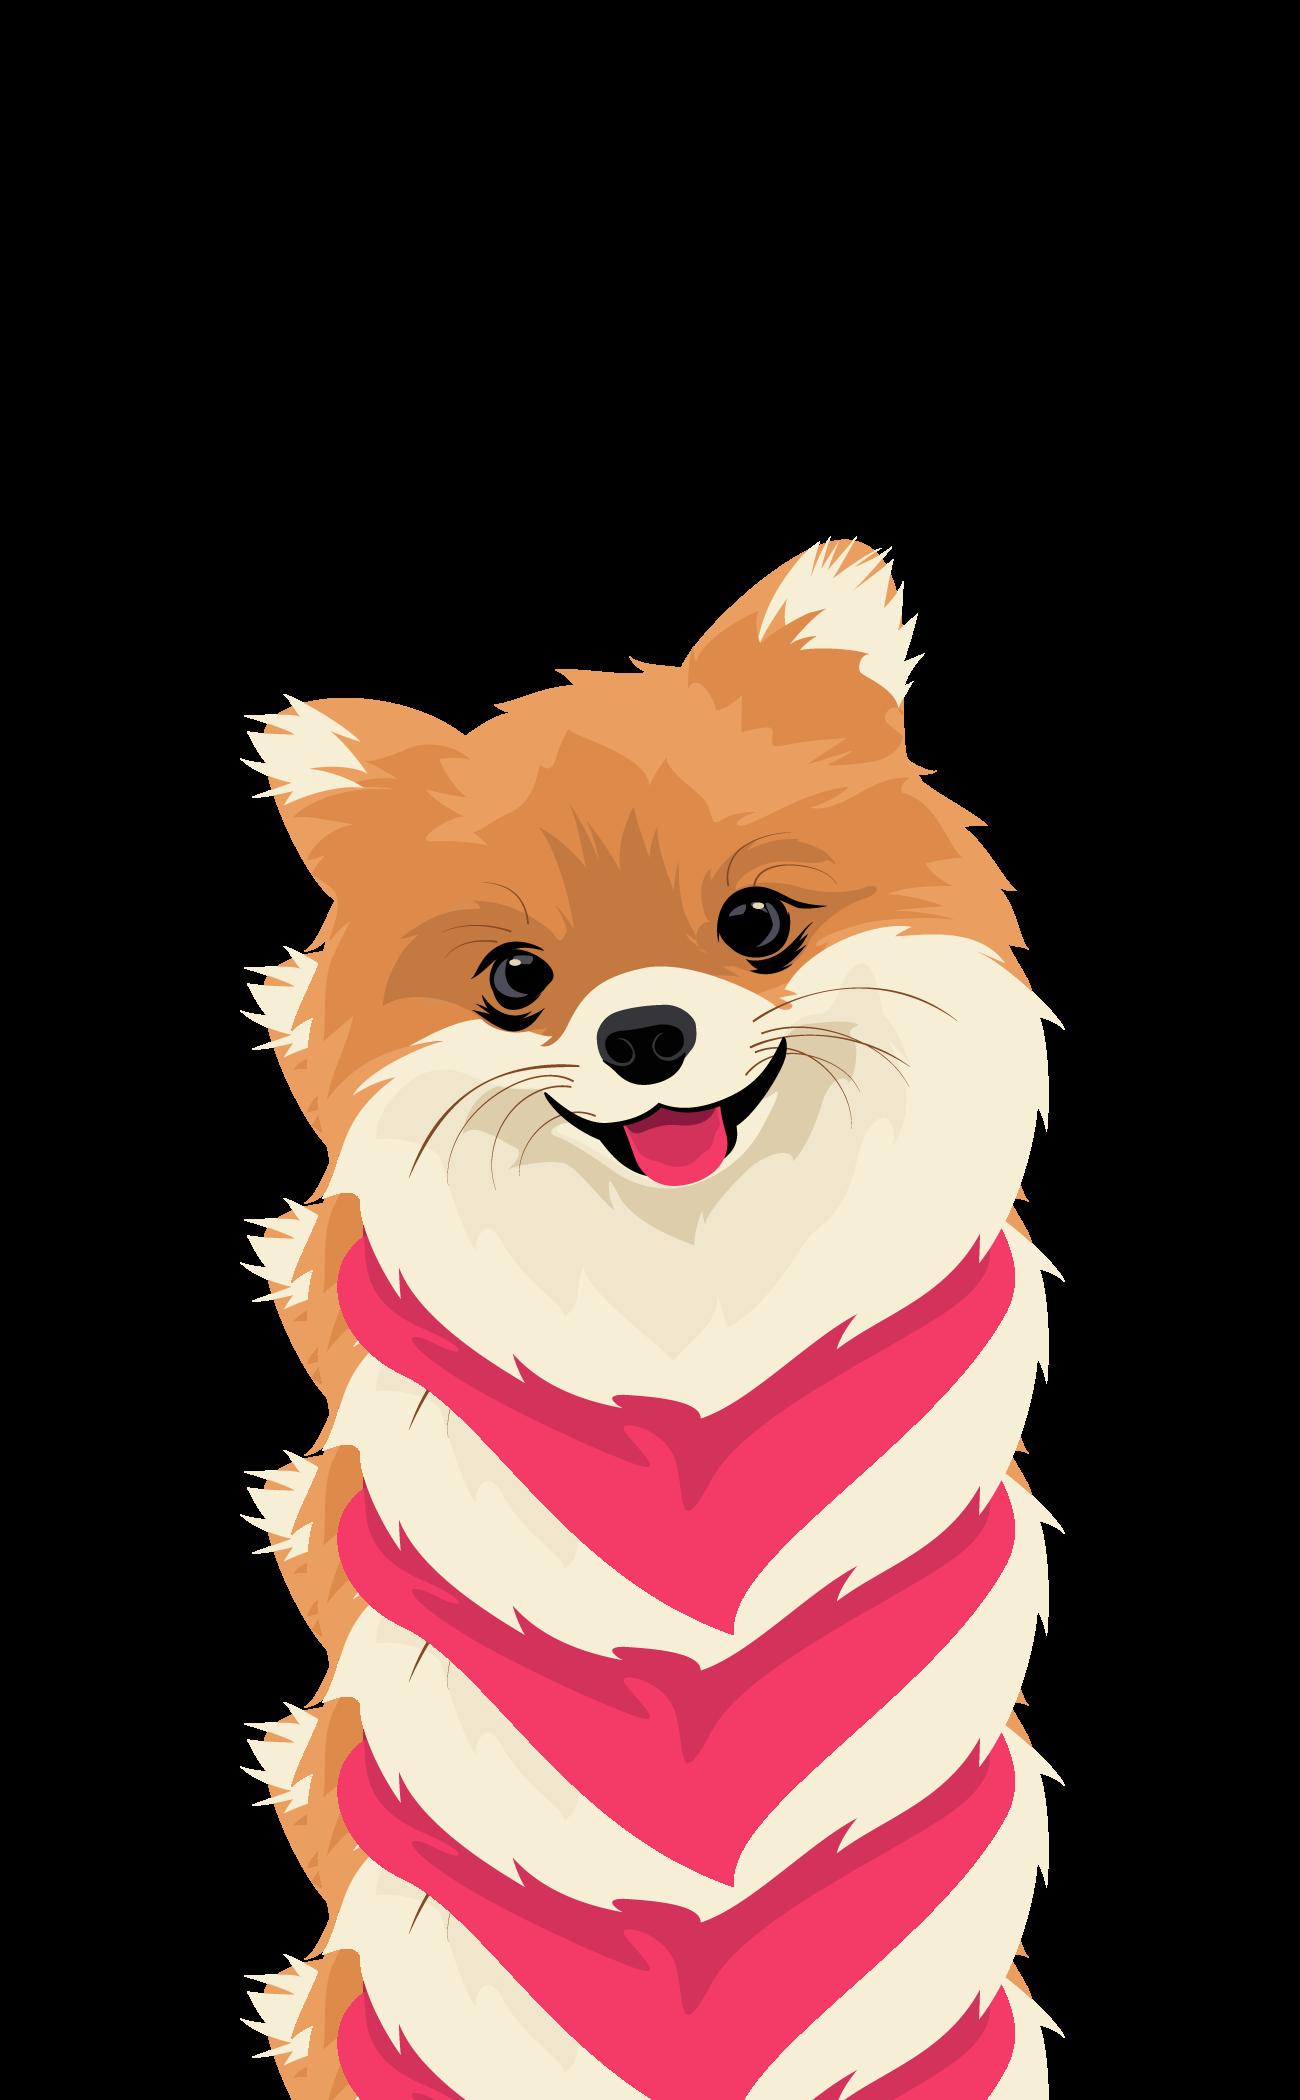 12 9 Inch Ipad Pro Folio Case Cute Pomeranian Dog Clear Ipad Case For Dog Lovers By The Little Cute Dog Cartoon Dog Illustration Cute Dog Wallpaper